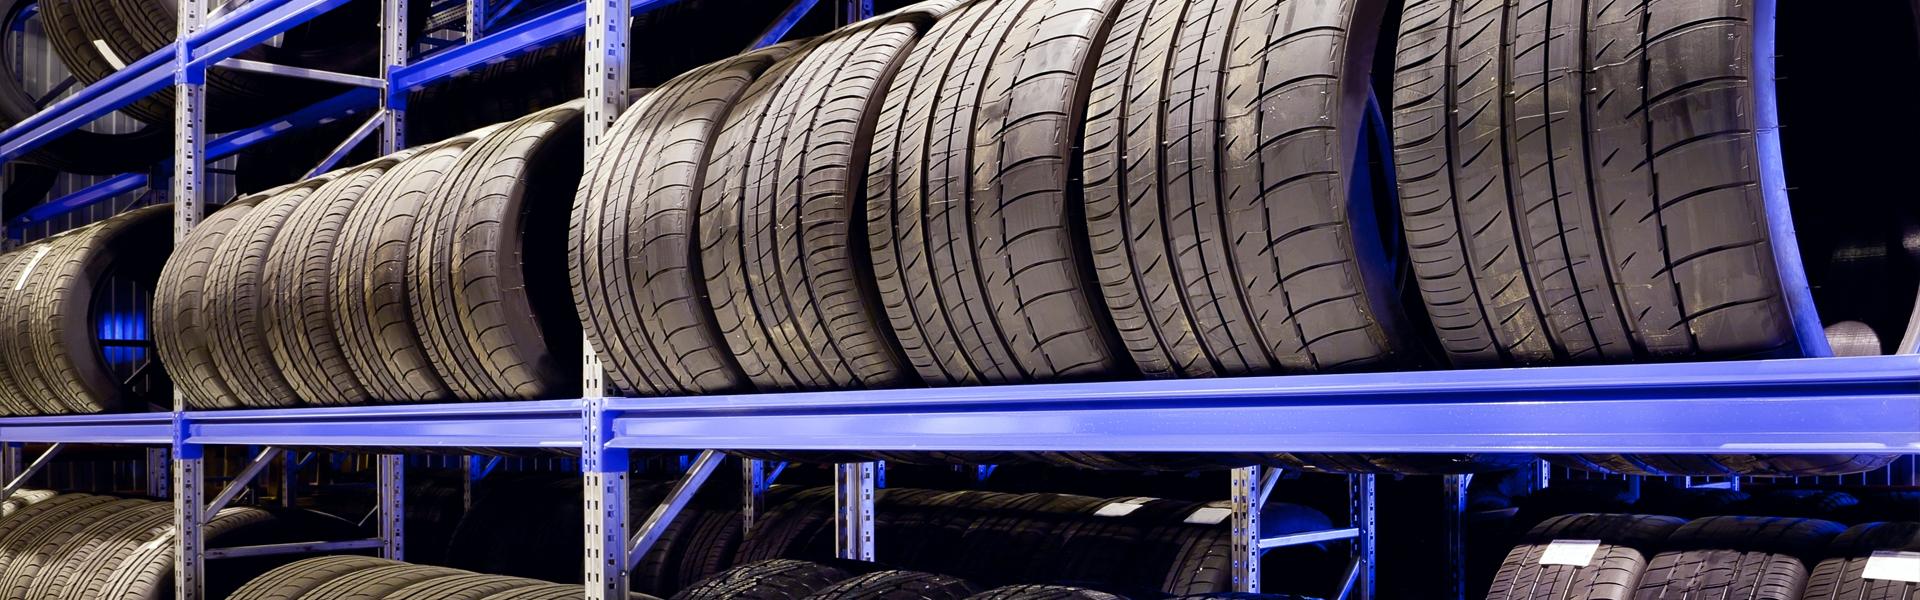 De neumáticos Continental, Hankook, Vredestein, Michelin, Pirelli, Matador, Barum, Bridgestone, Dunlop, Goodyear, Falken